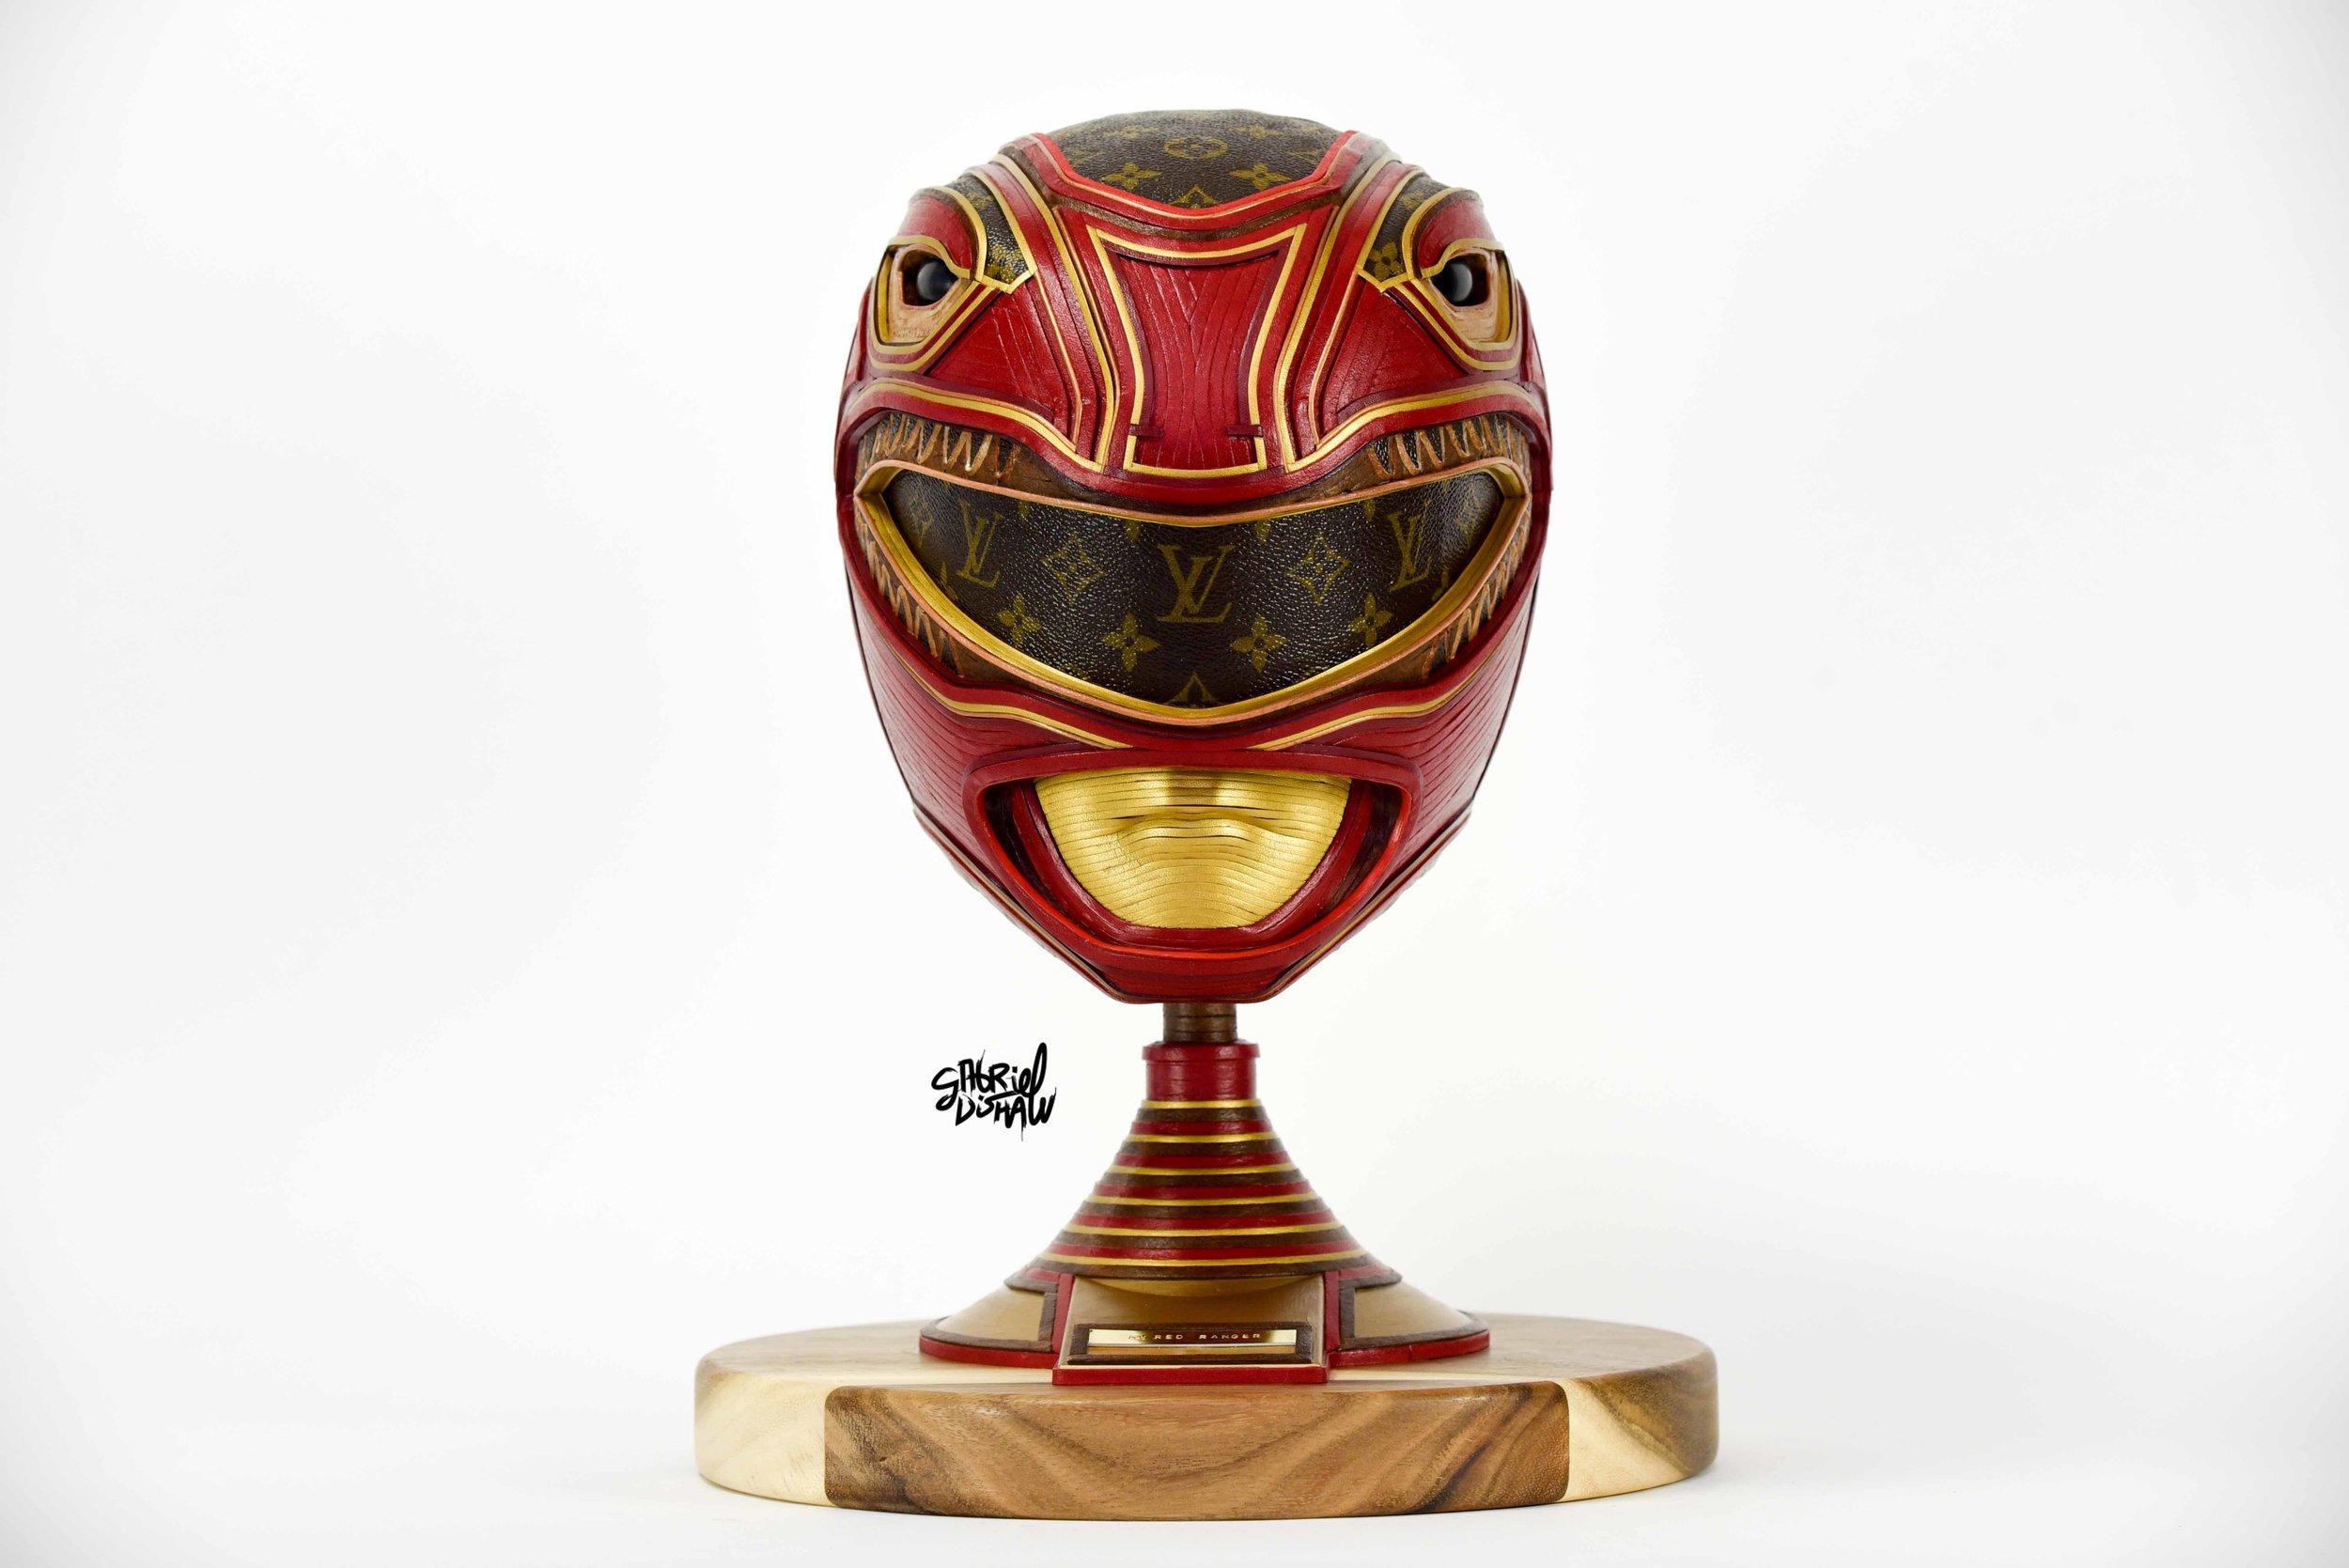 Gabriel Dishaw LV Red Ranger-3201.jpg